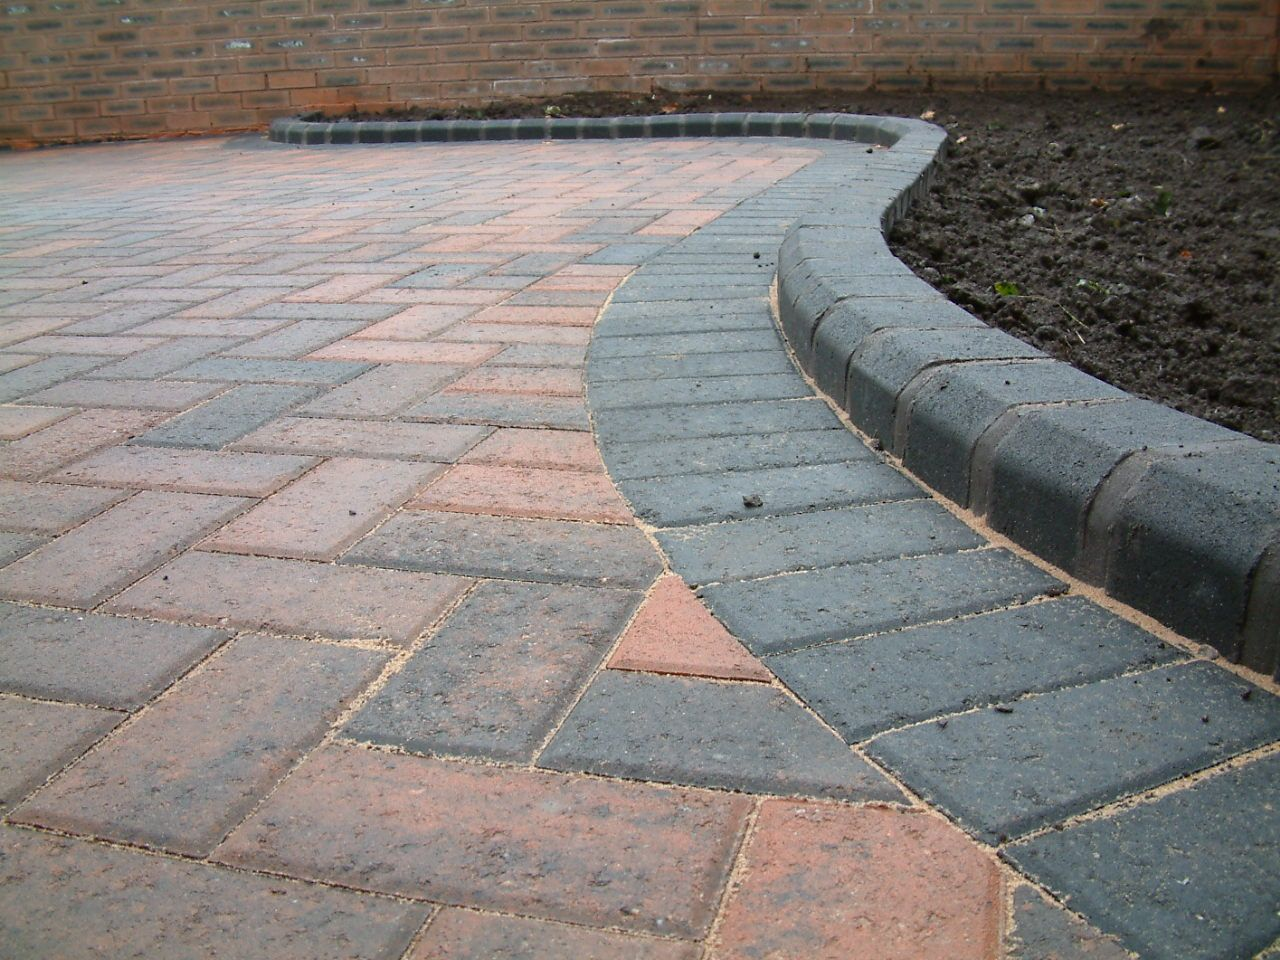 Kerbed Charcoal Brick Edging Around A Patio Brick Edging Patio